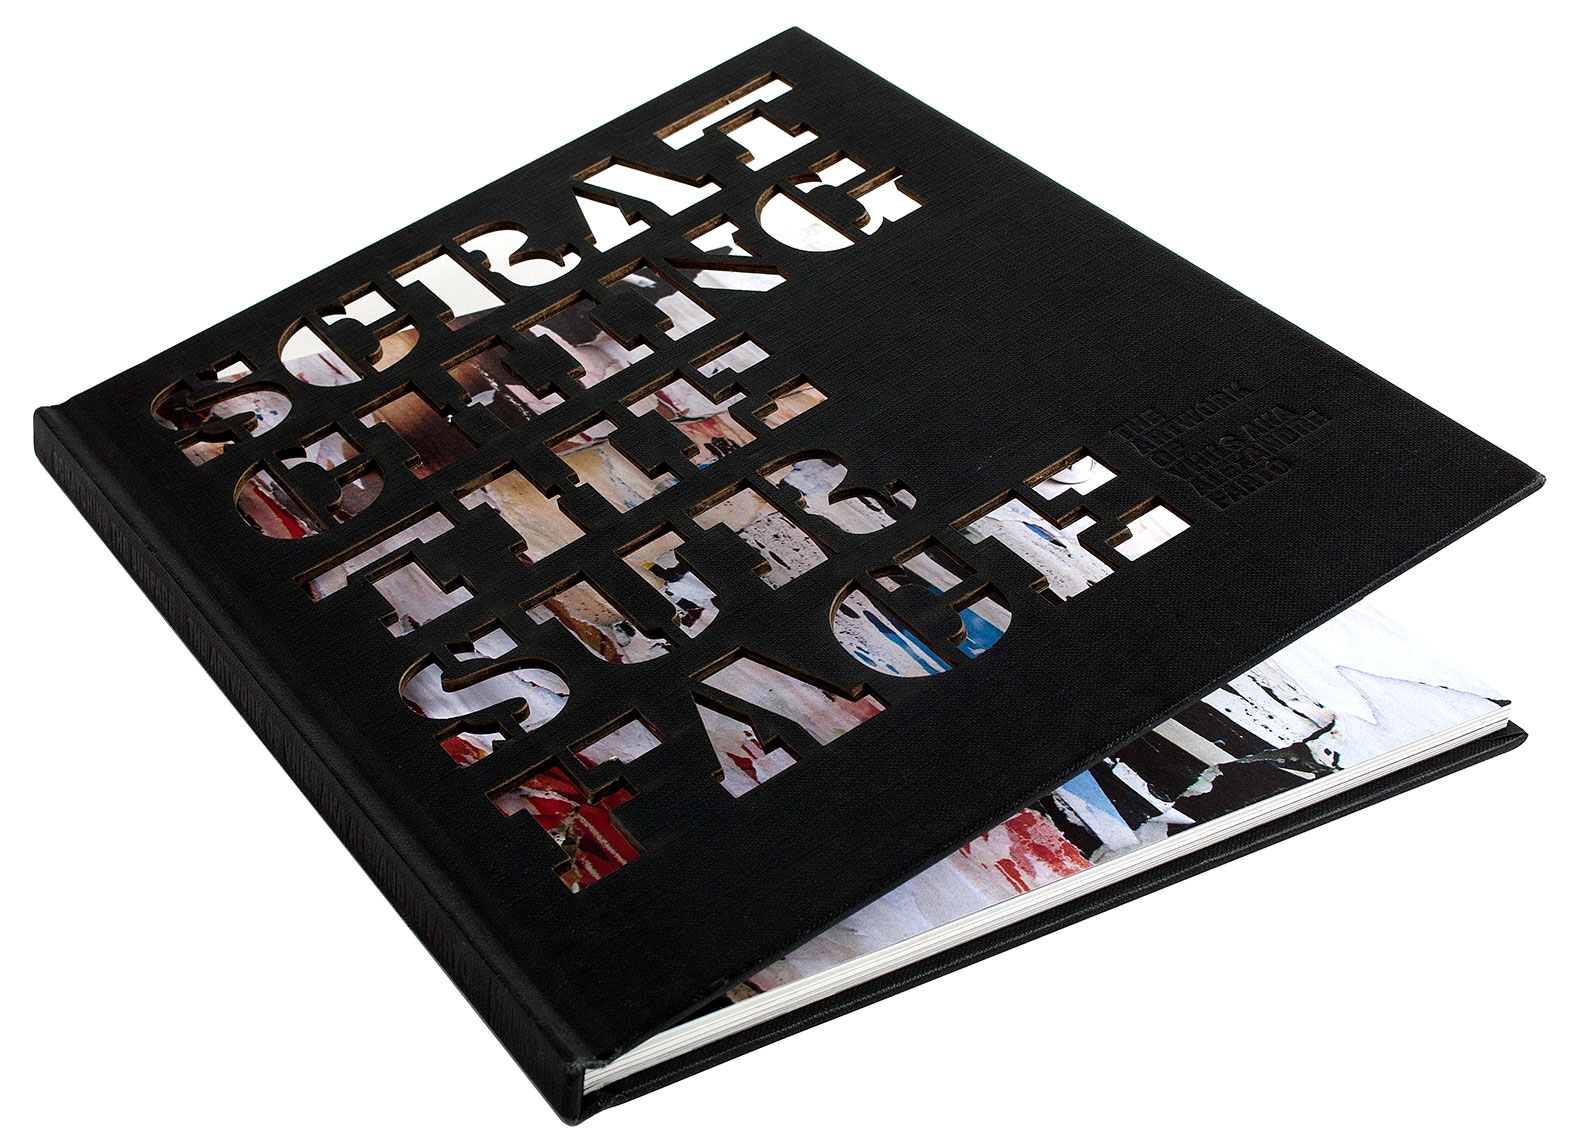 epm-print-management-bristol-art-books-1.jpg